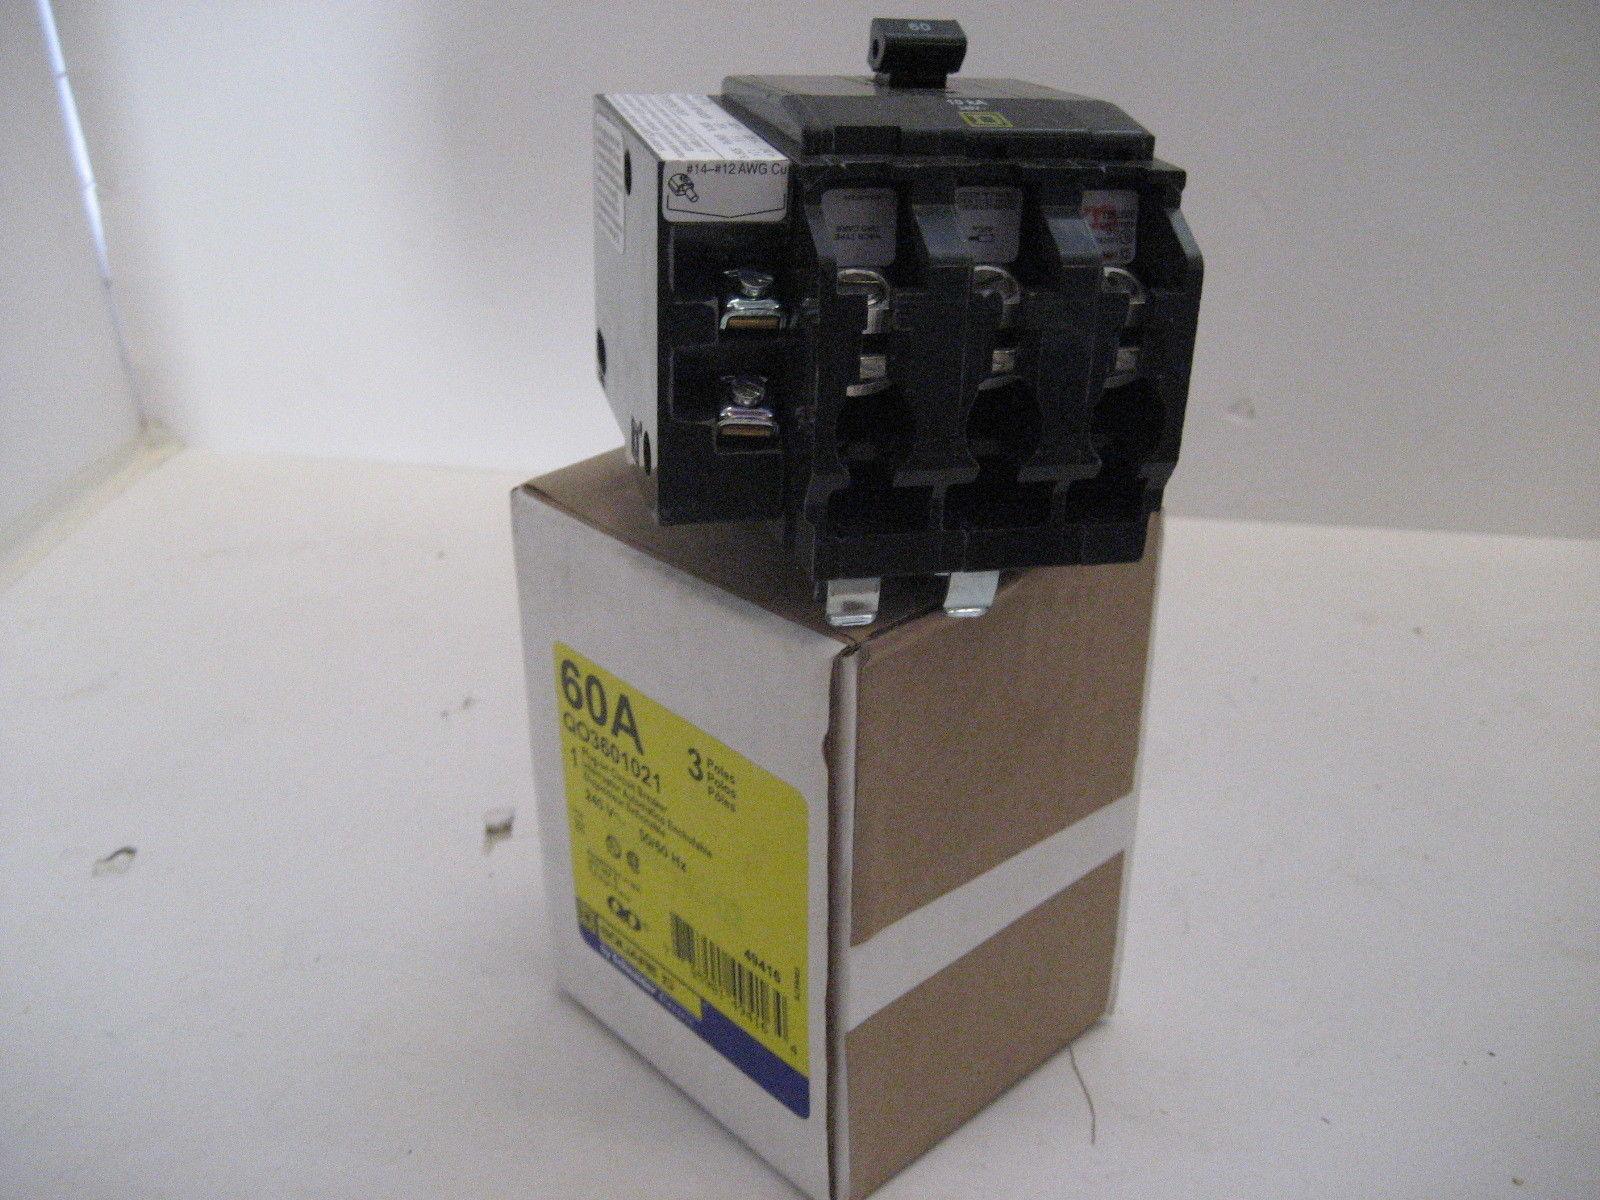 New In Box Square D Qo3601021 3 Pole 60 Amp 240 Volt Shunt Trip Trippingcircuitbreakerpaneljpg